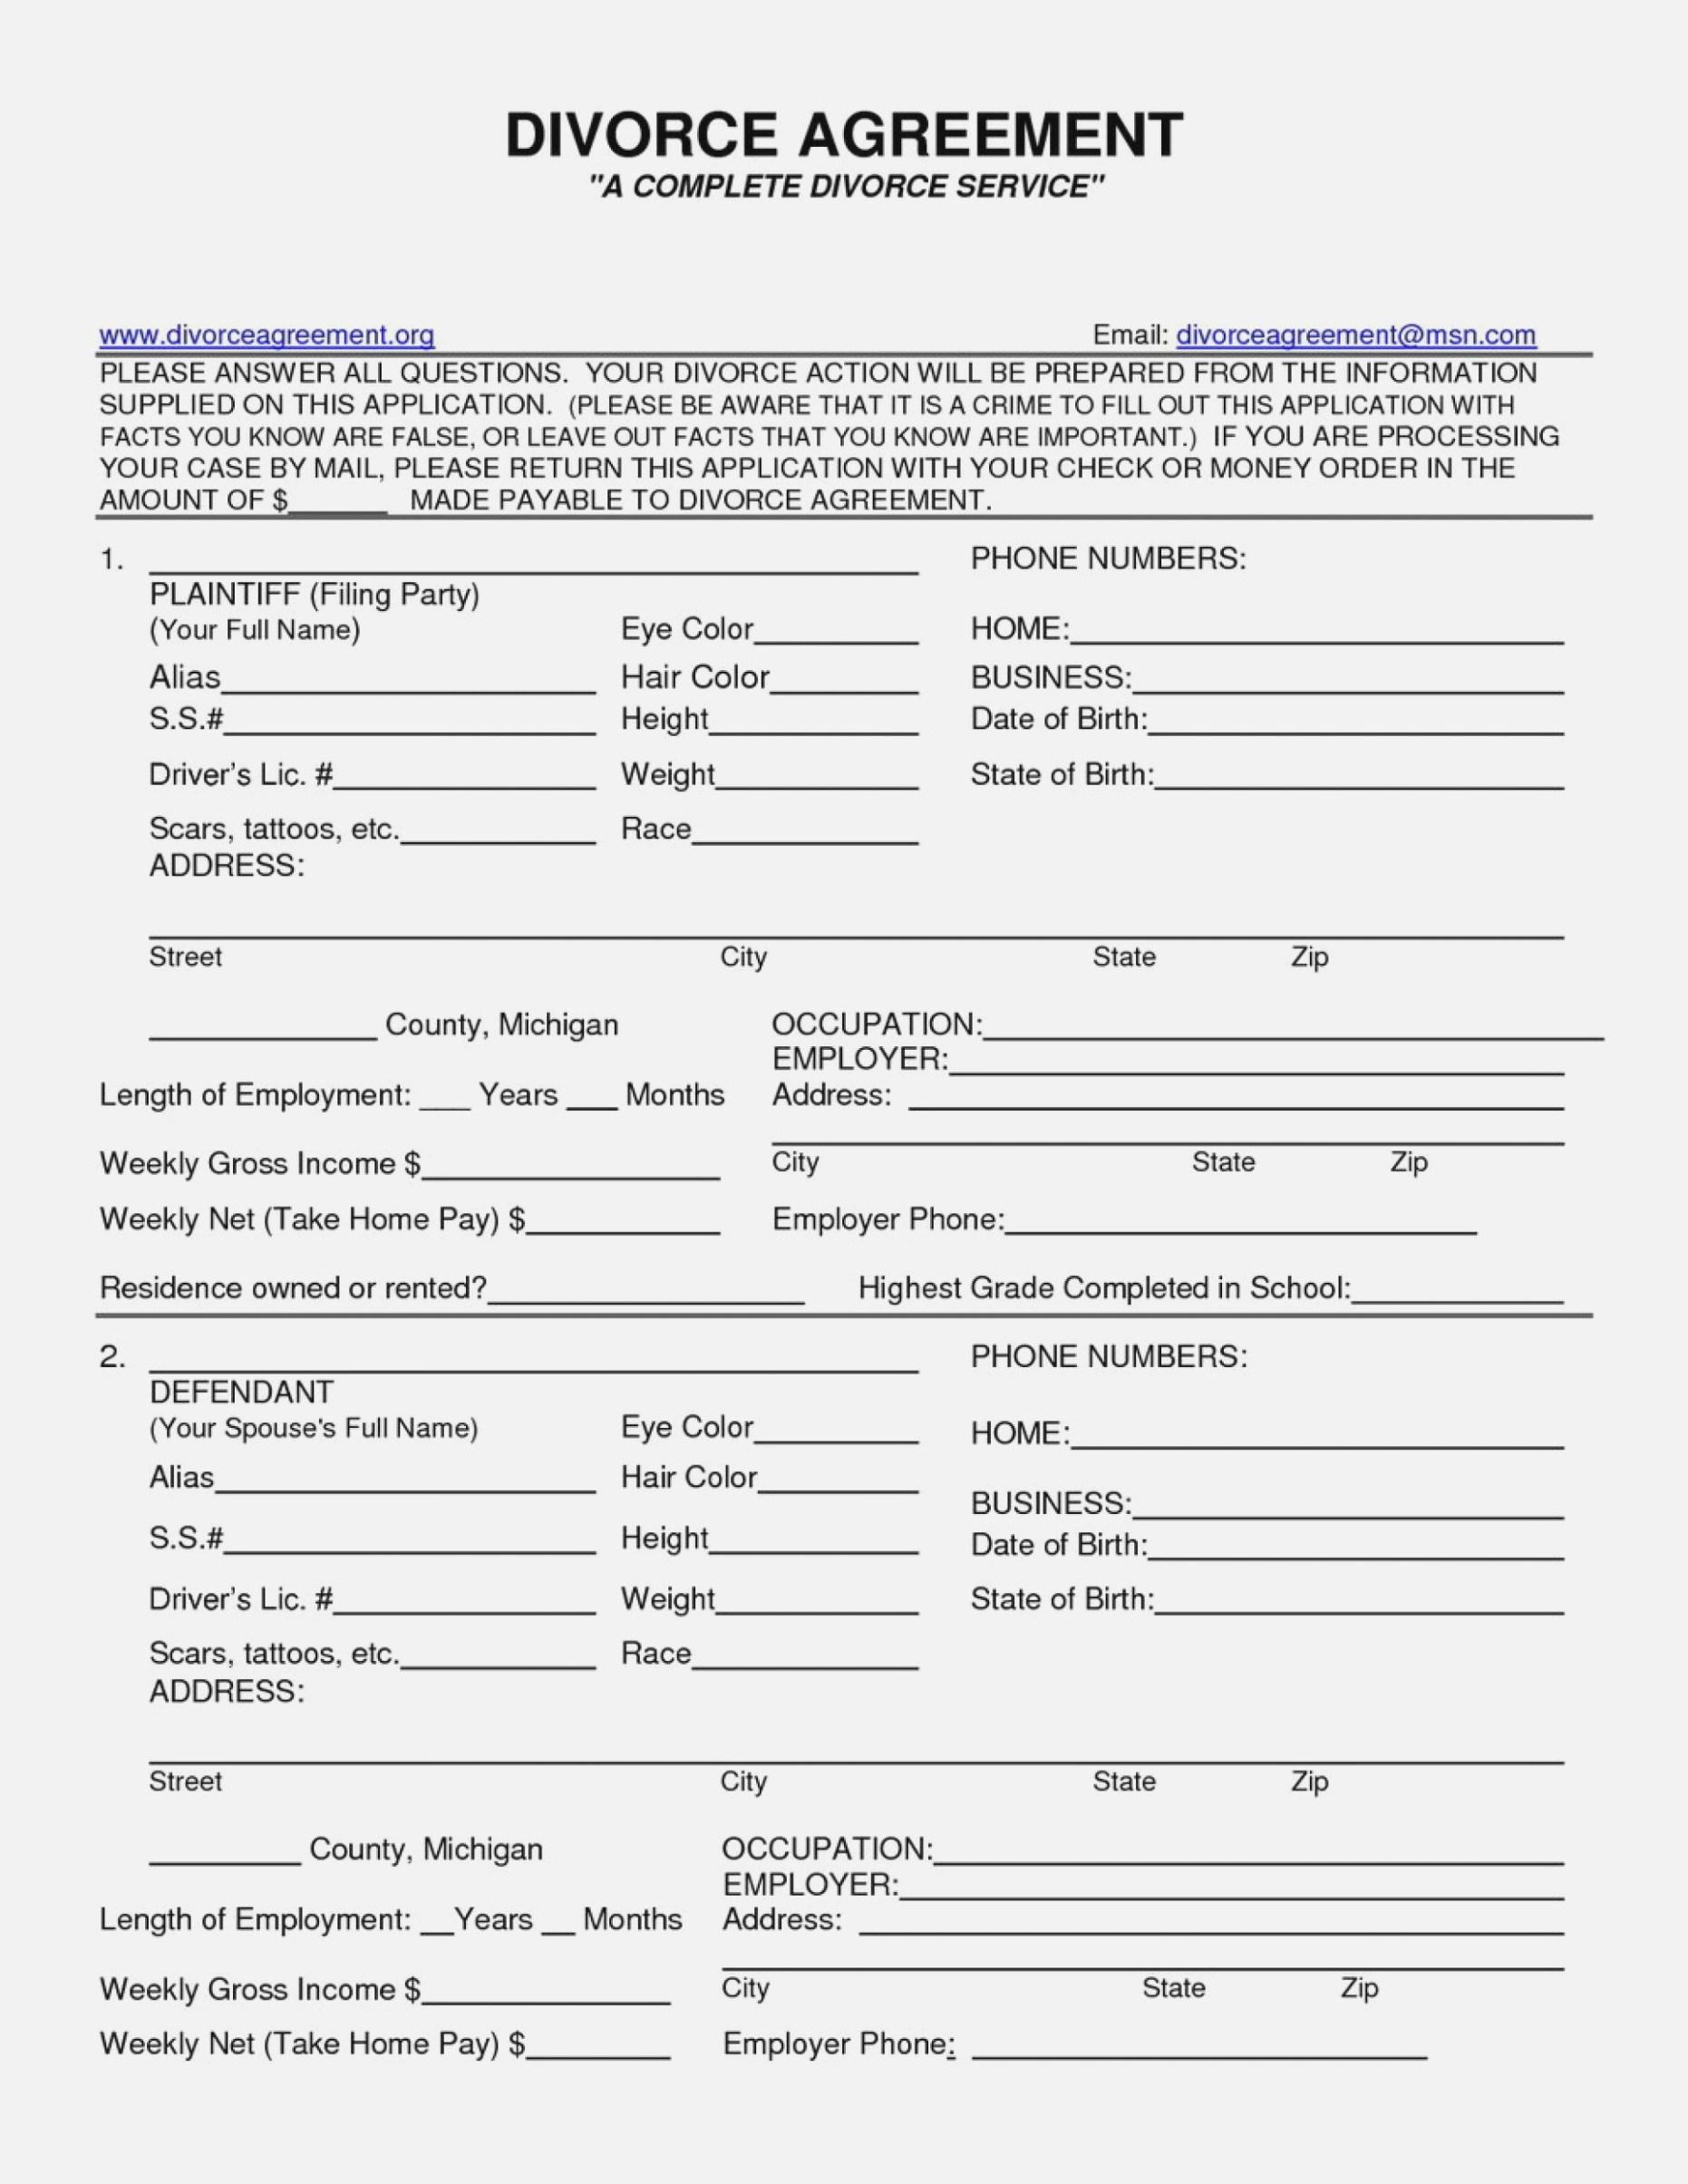 Louisiana Succession Forms – Free Louisiana Small Estate Affidavit - Free Printable Divorce Papers For Louisiana